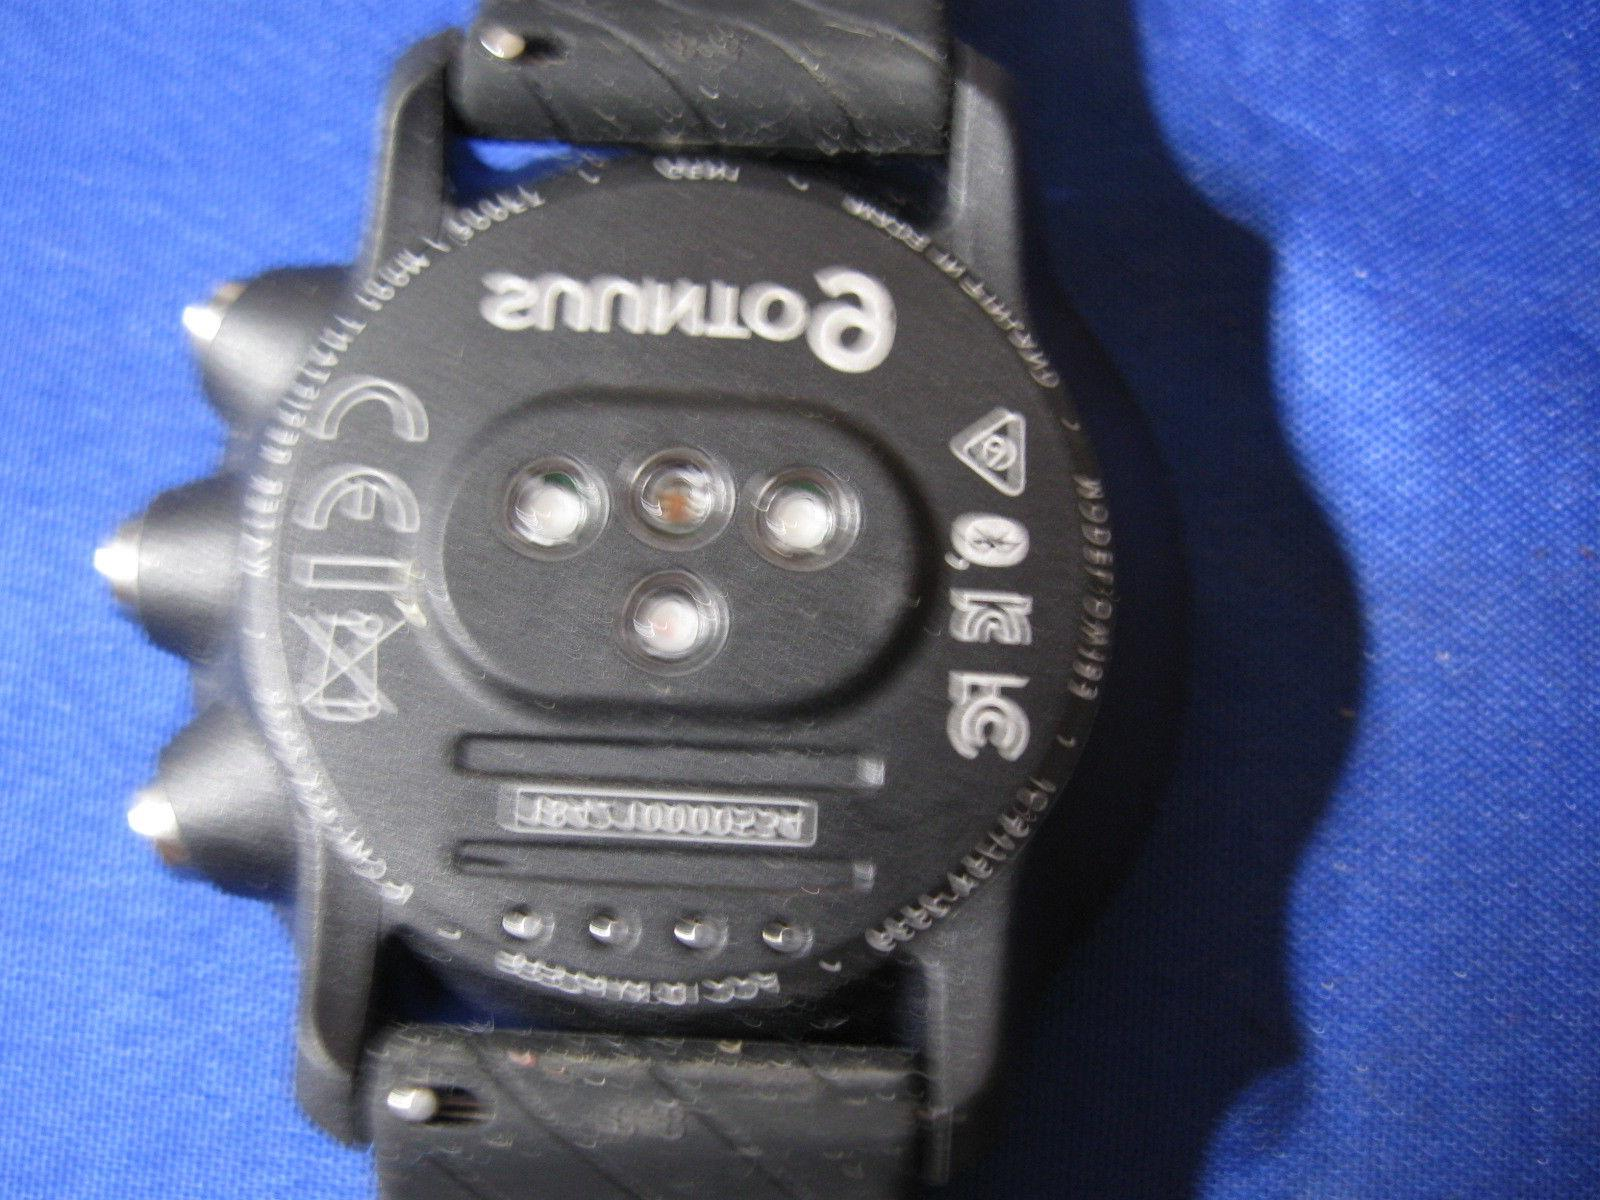 SUUNTO BLACK WRIST SPORT GPS WATCH